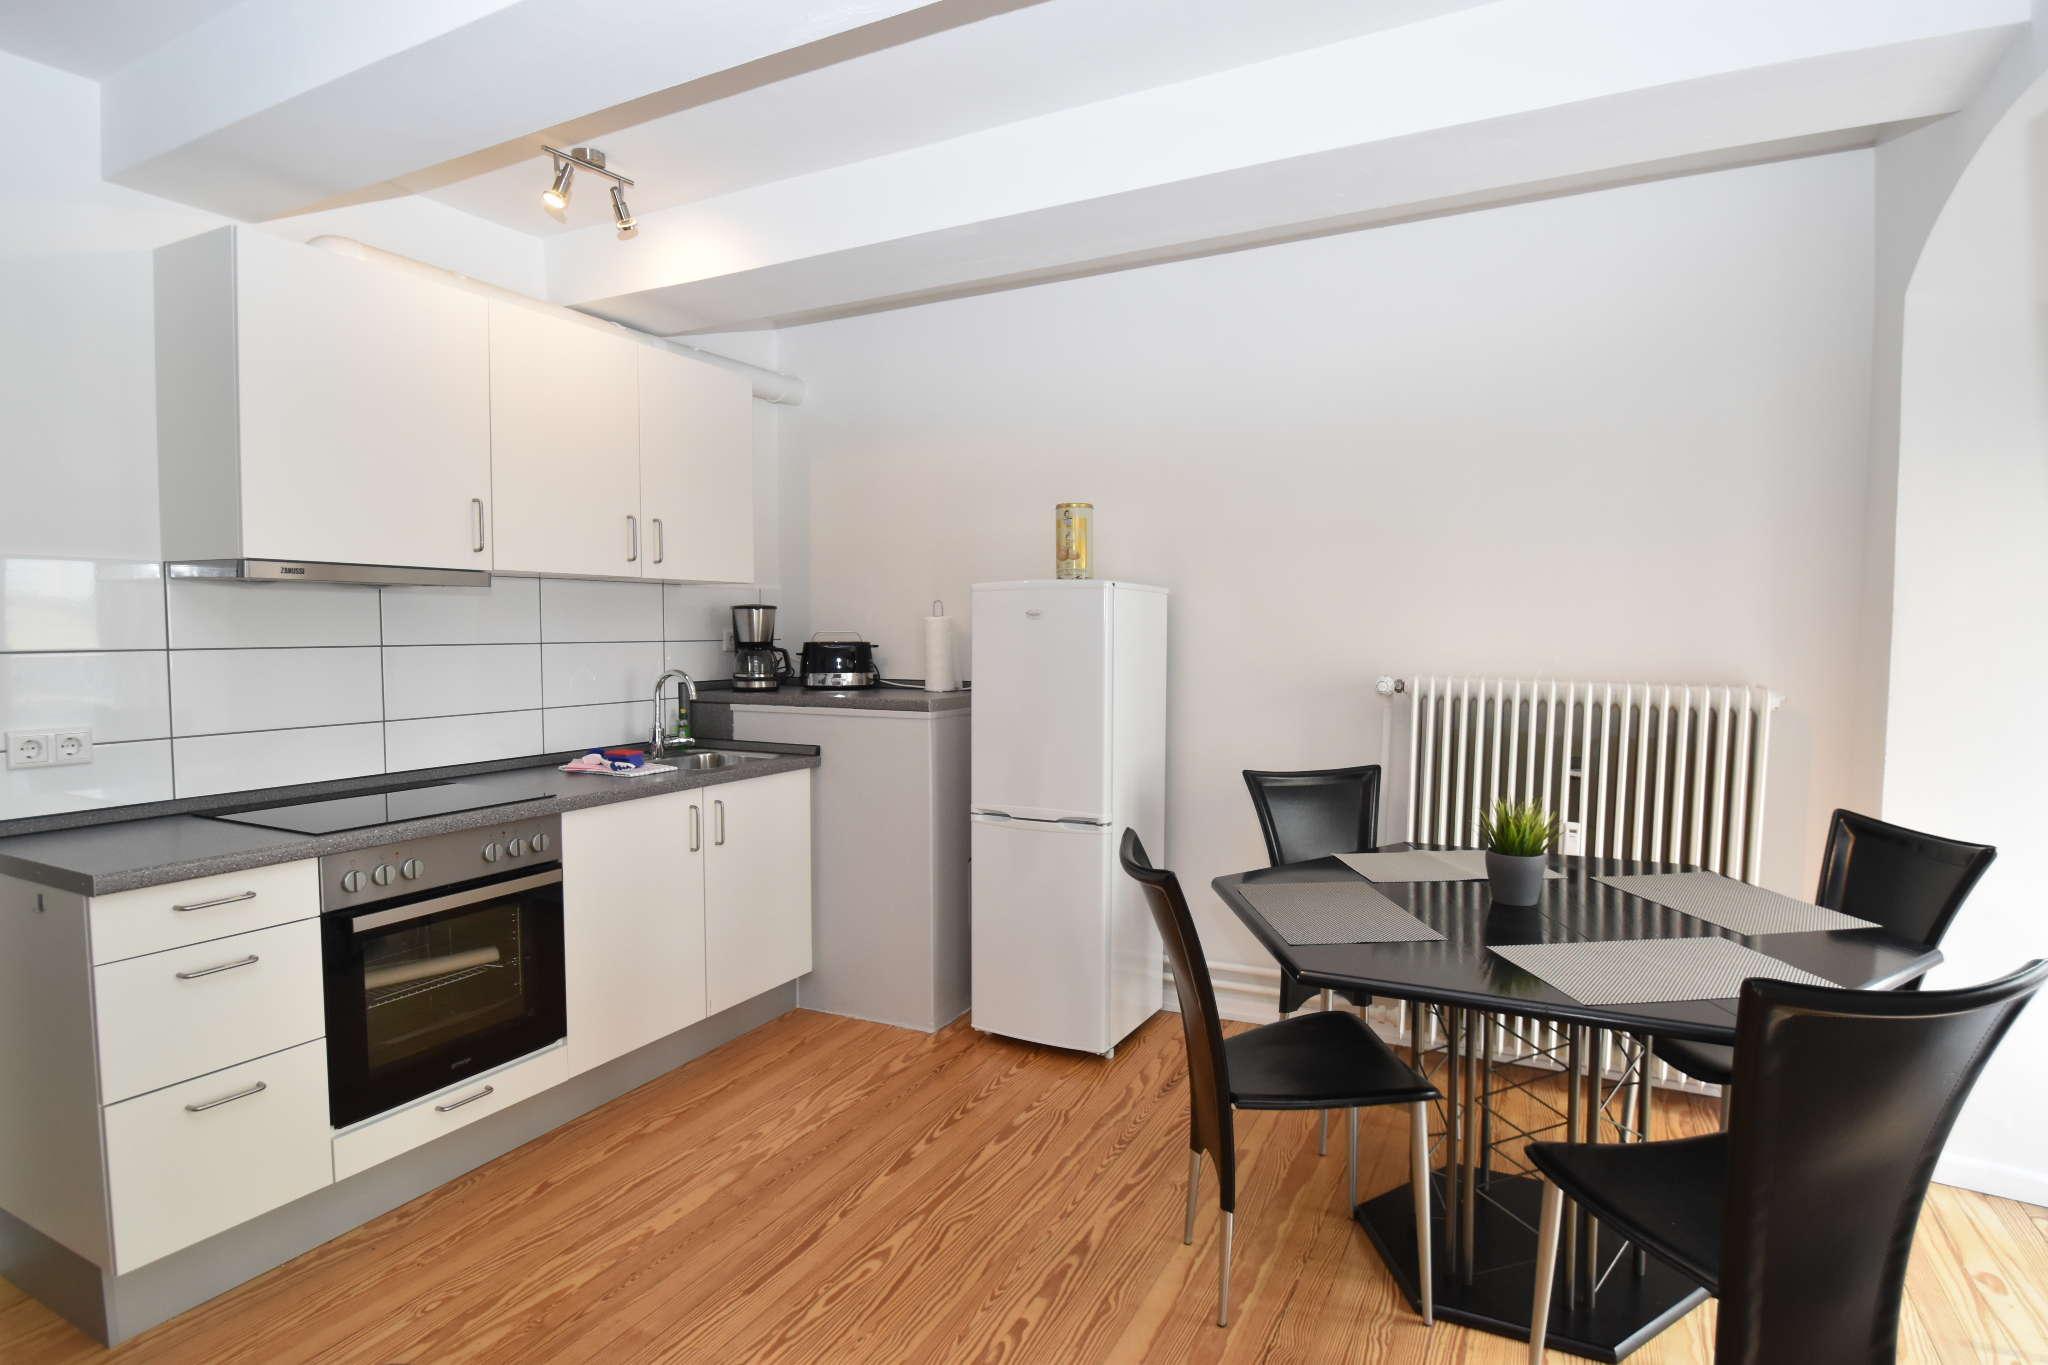 ferienwohnung det gamle toldhus in flensburg schleswig holstein g nter blankenagel. Black Bedroom Furniture Sets. Home Design Ideas